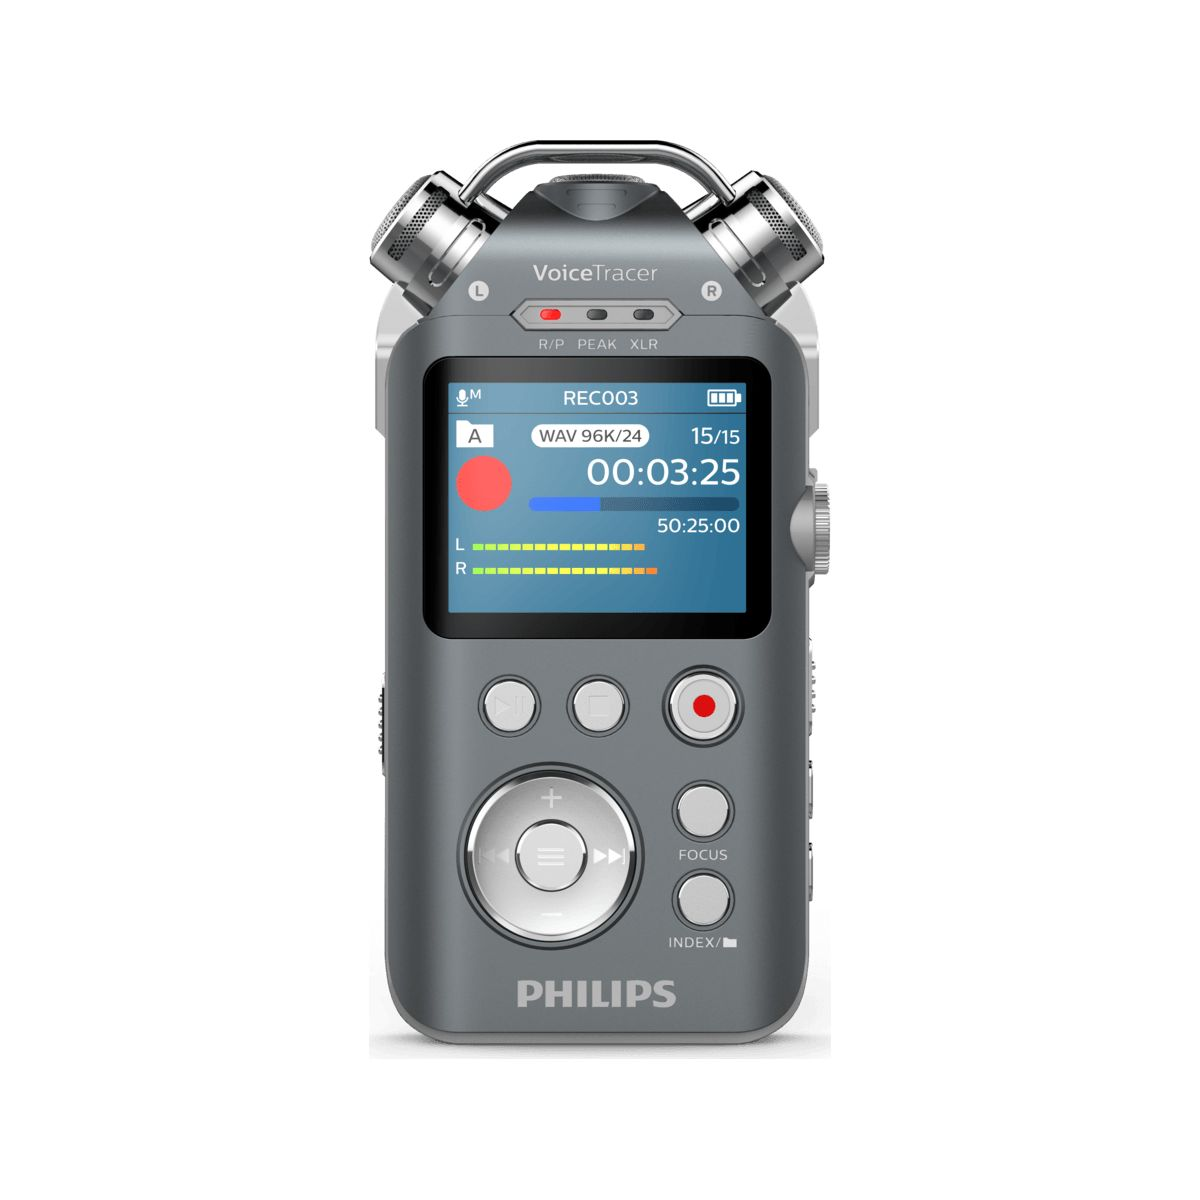 Dictaphone PHILIPS DVT7500 (photo)